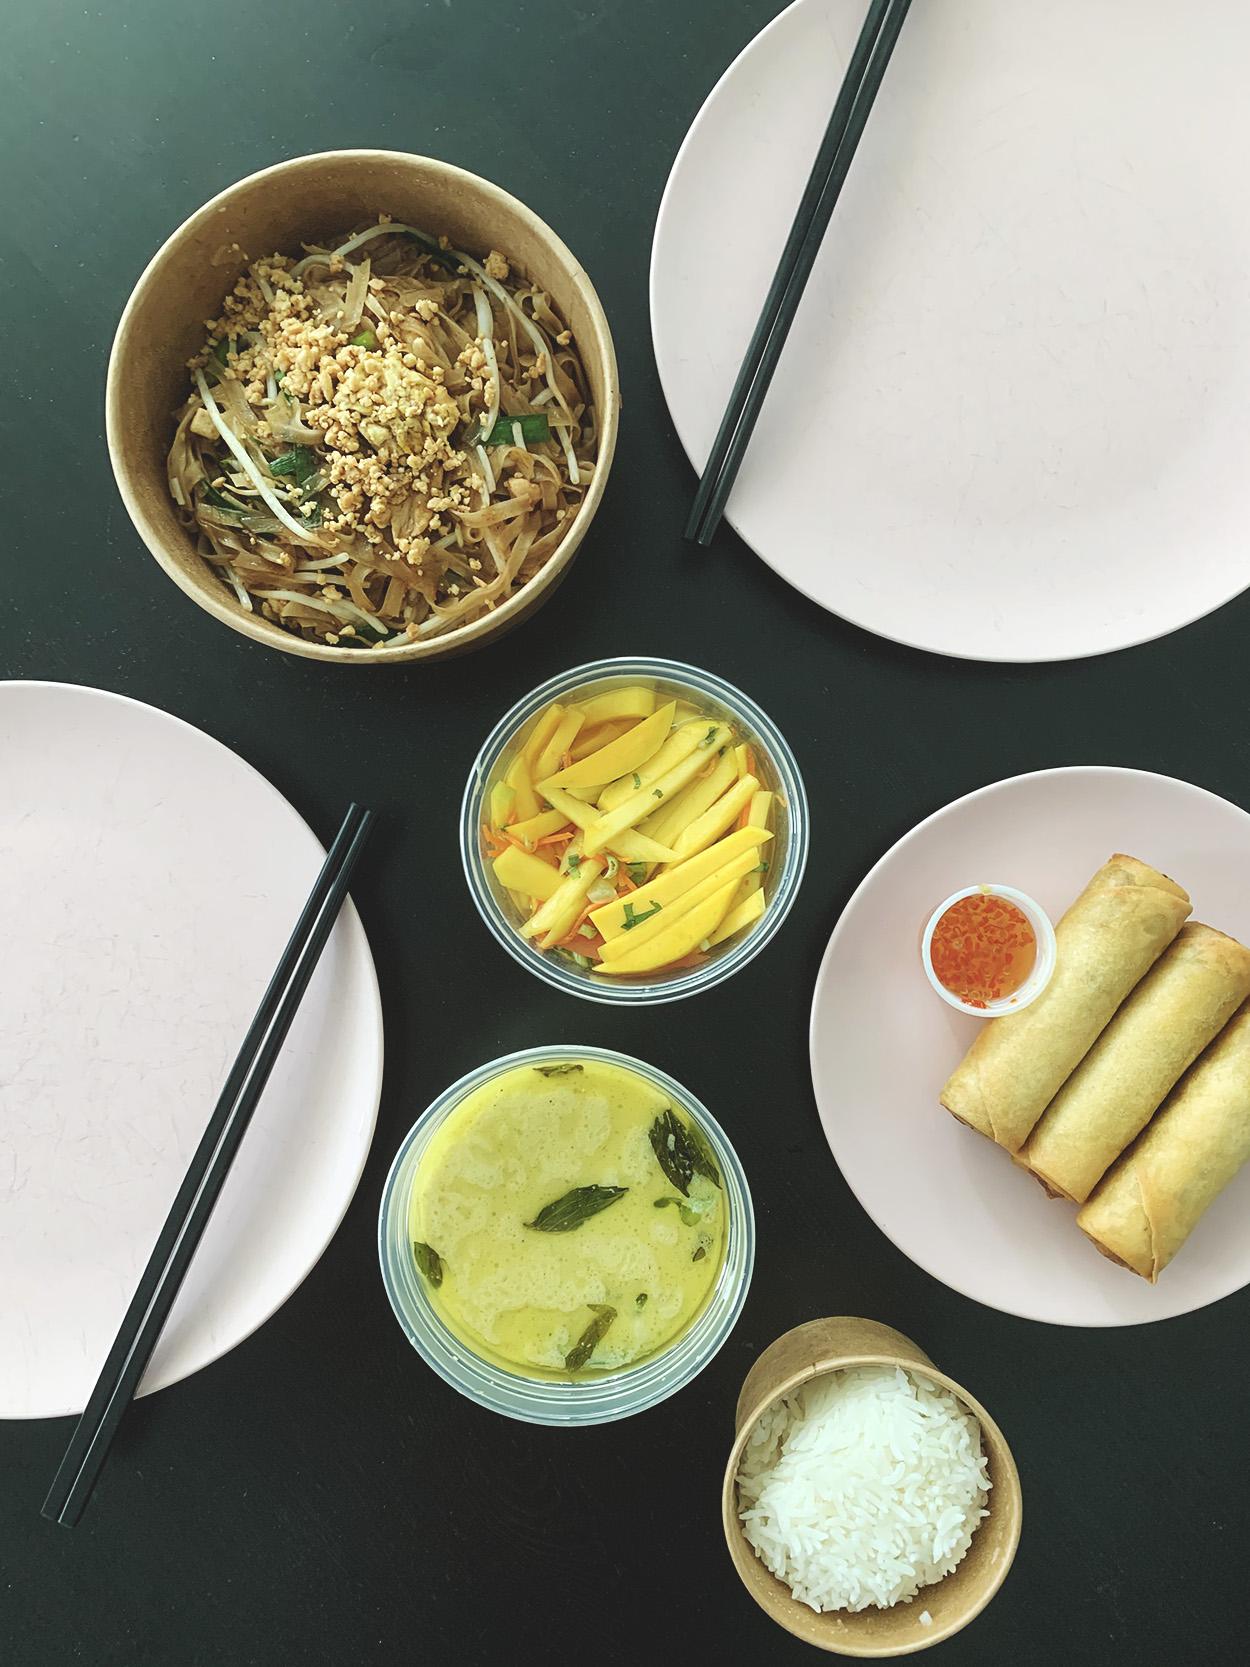 Thai takeout from Sukhothai Restaurant in Toronto